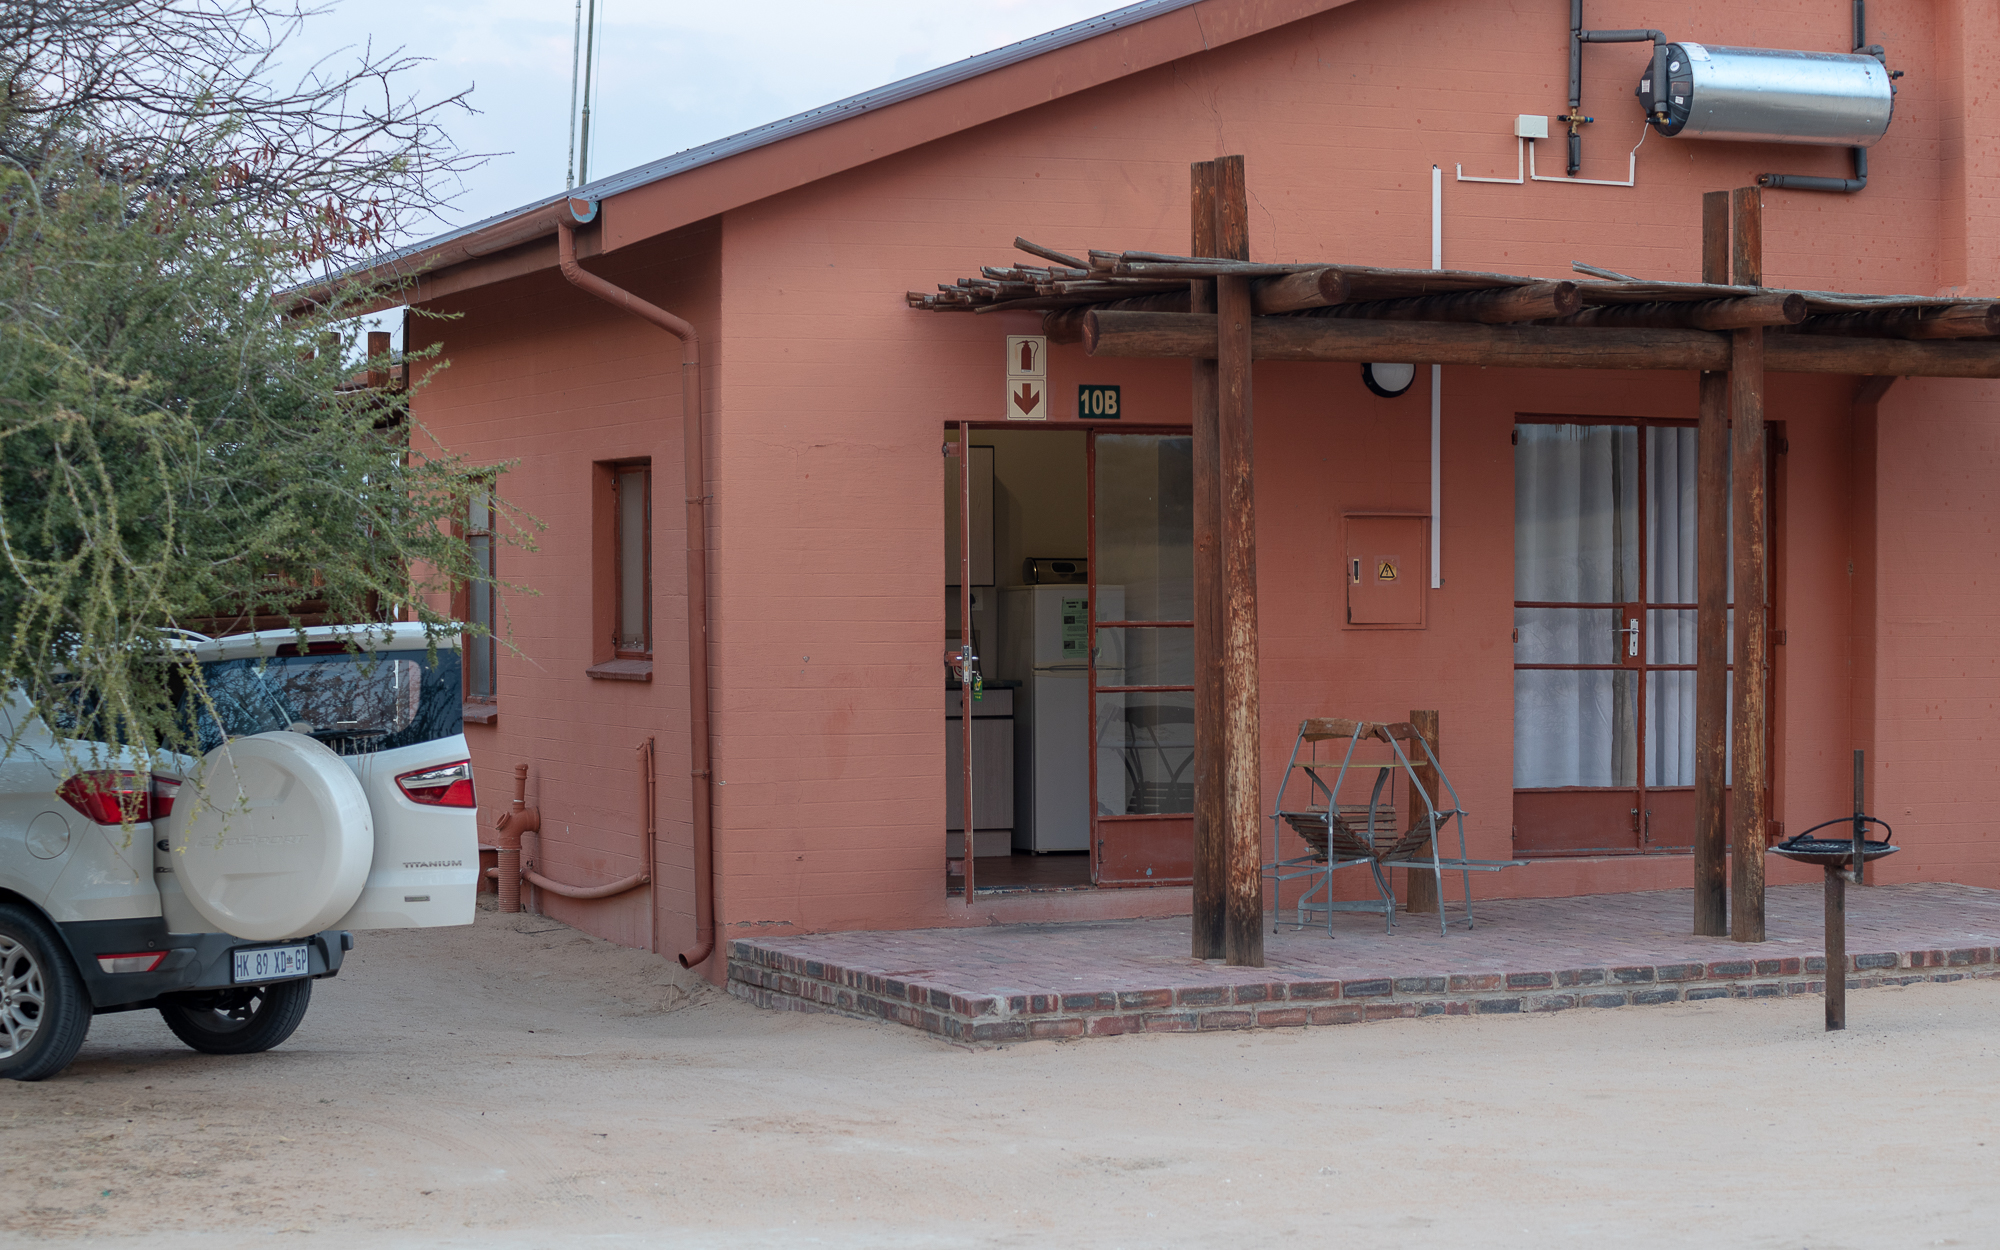 Chalet in Nossob, Kgalagadi.